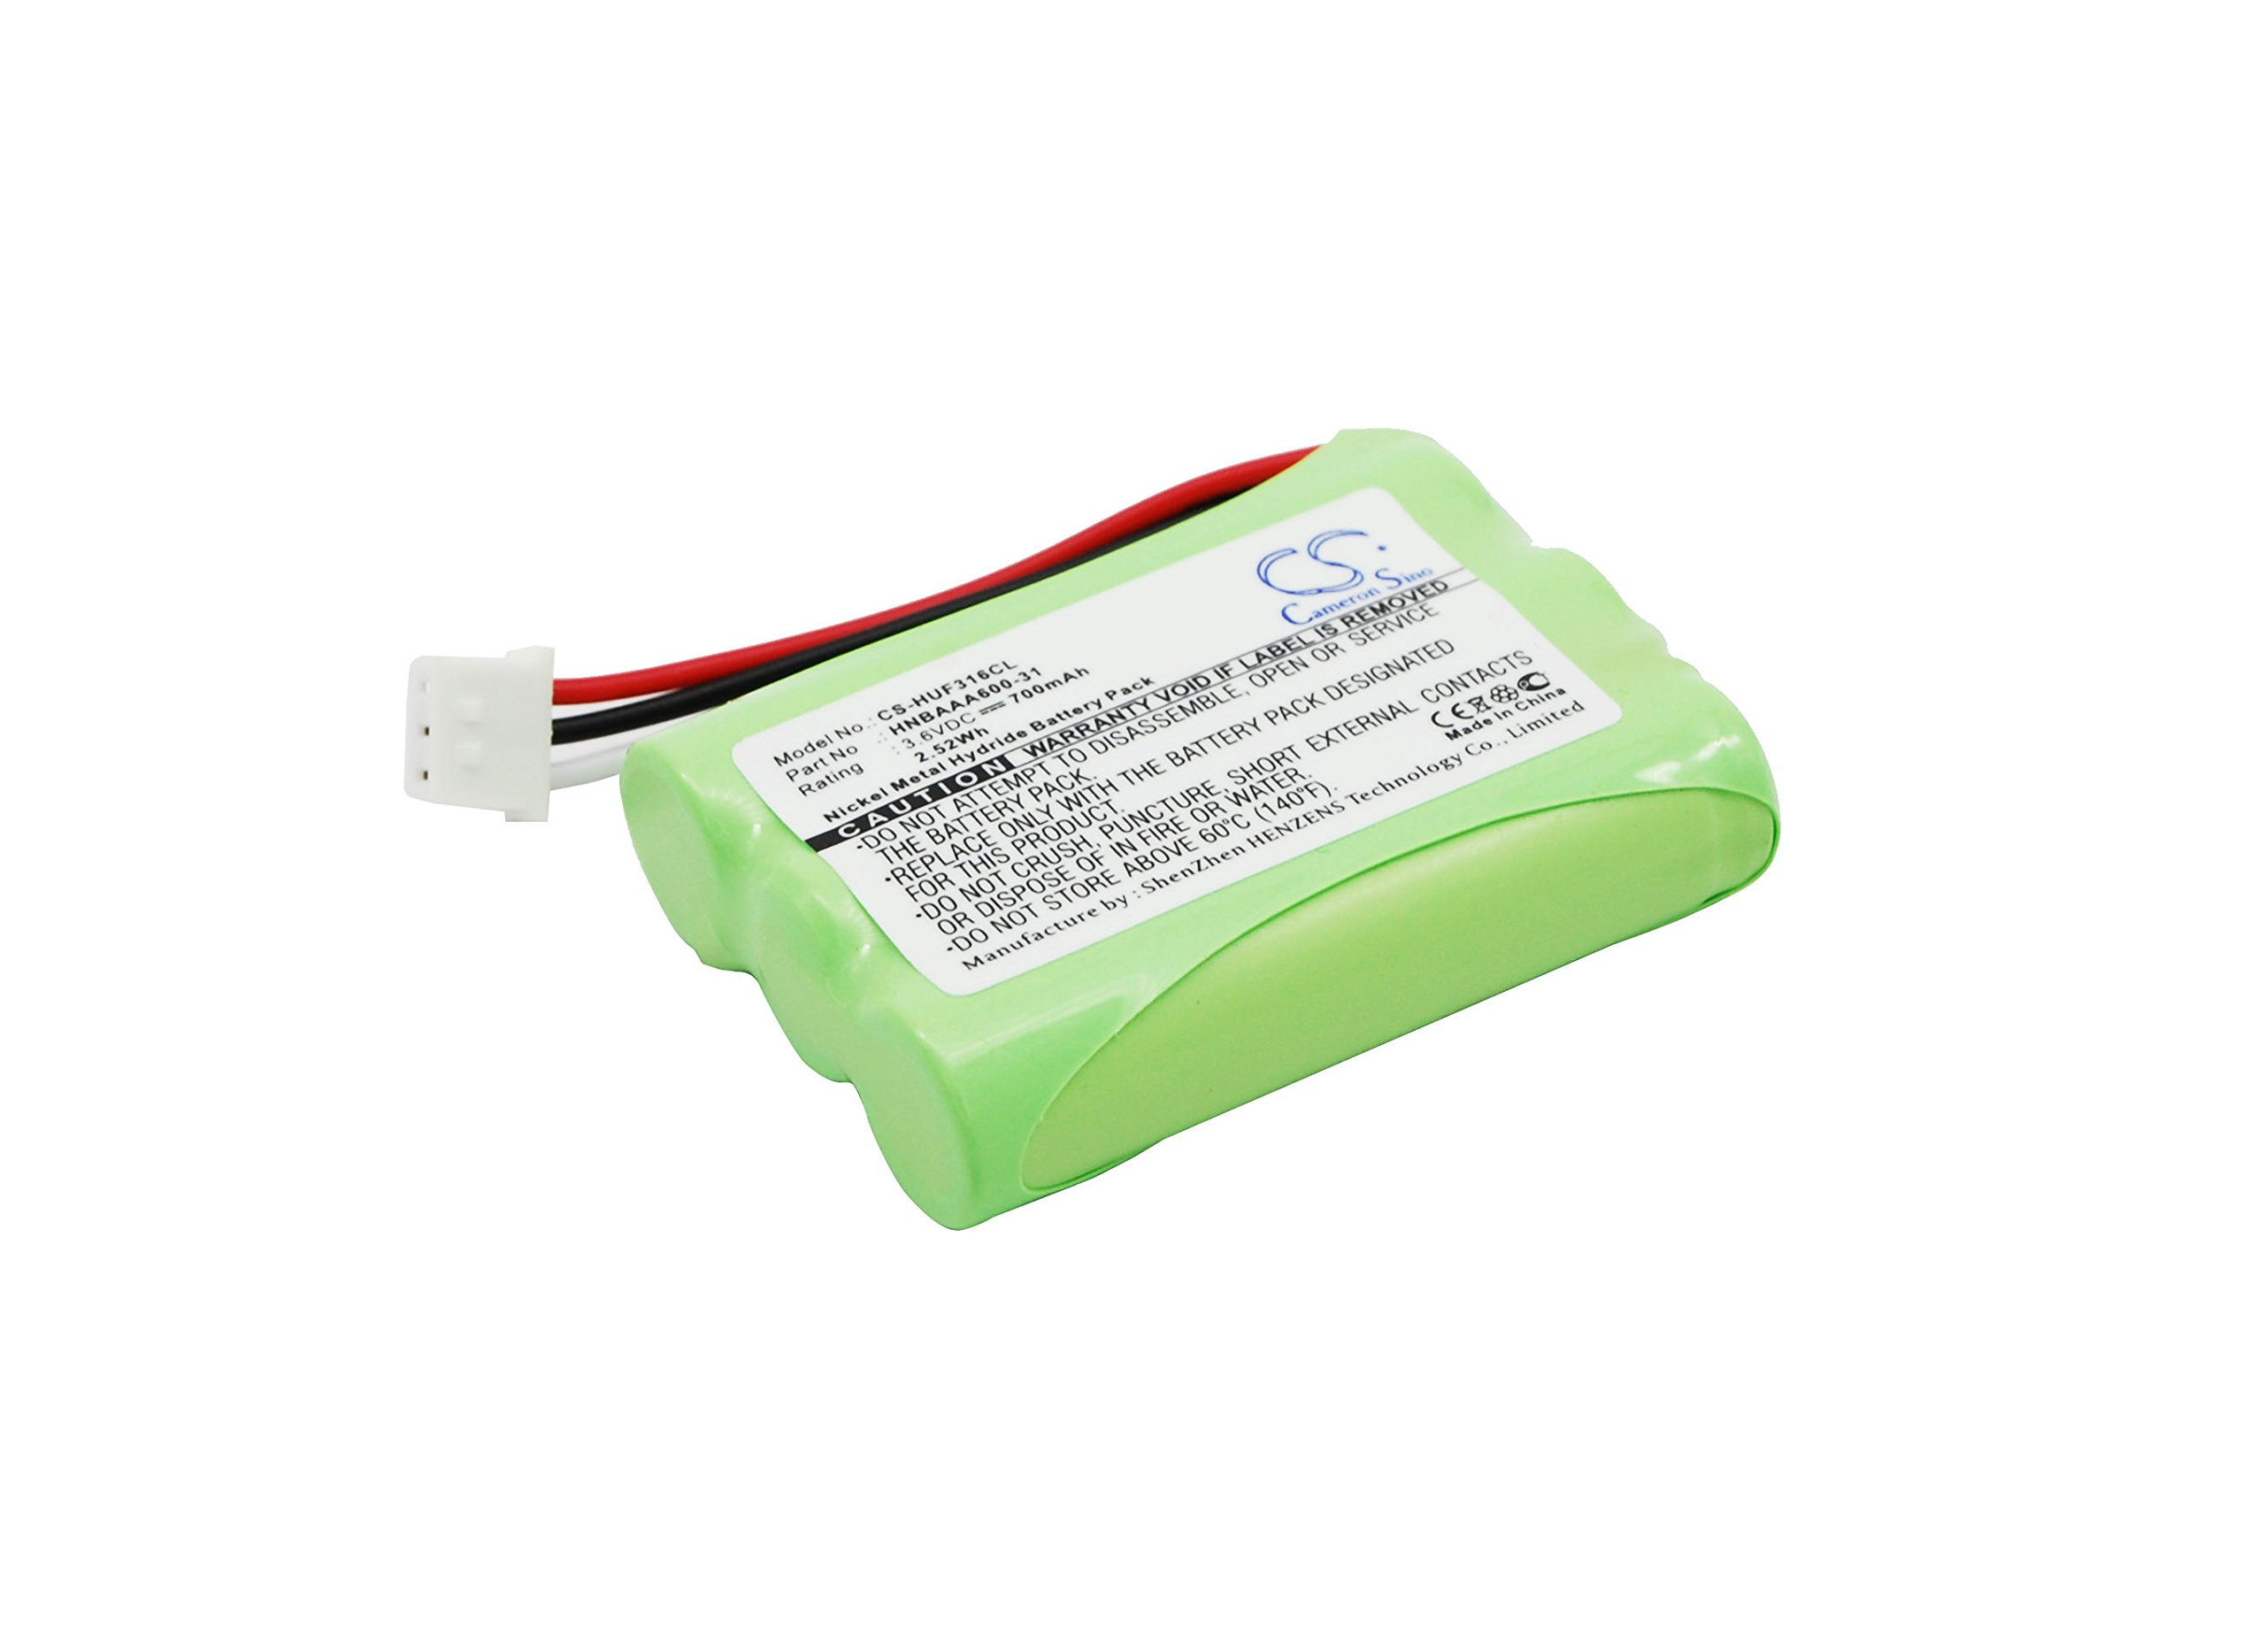 Bateria : Huawei F202 F316 F317 F360